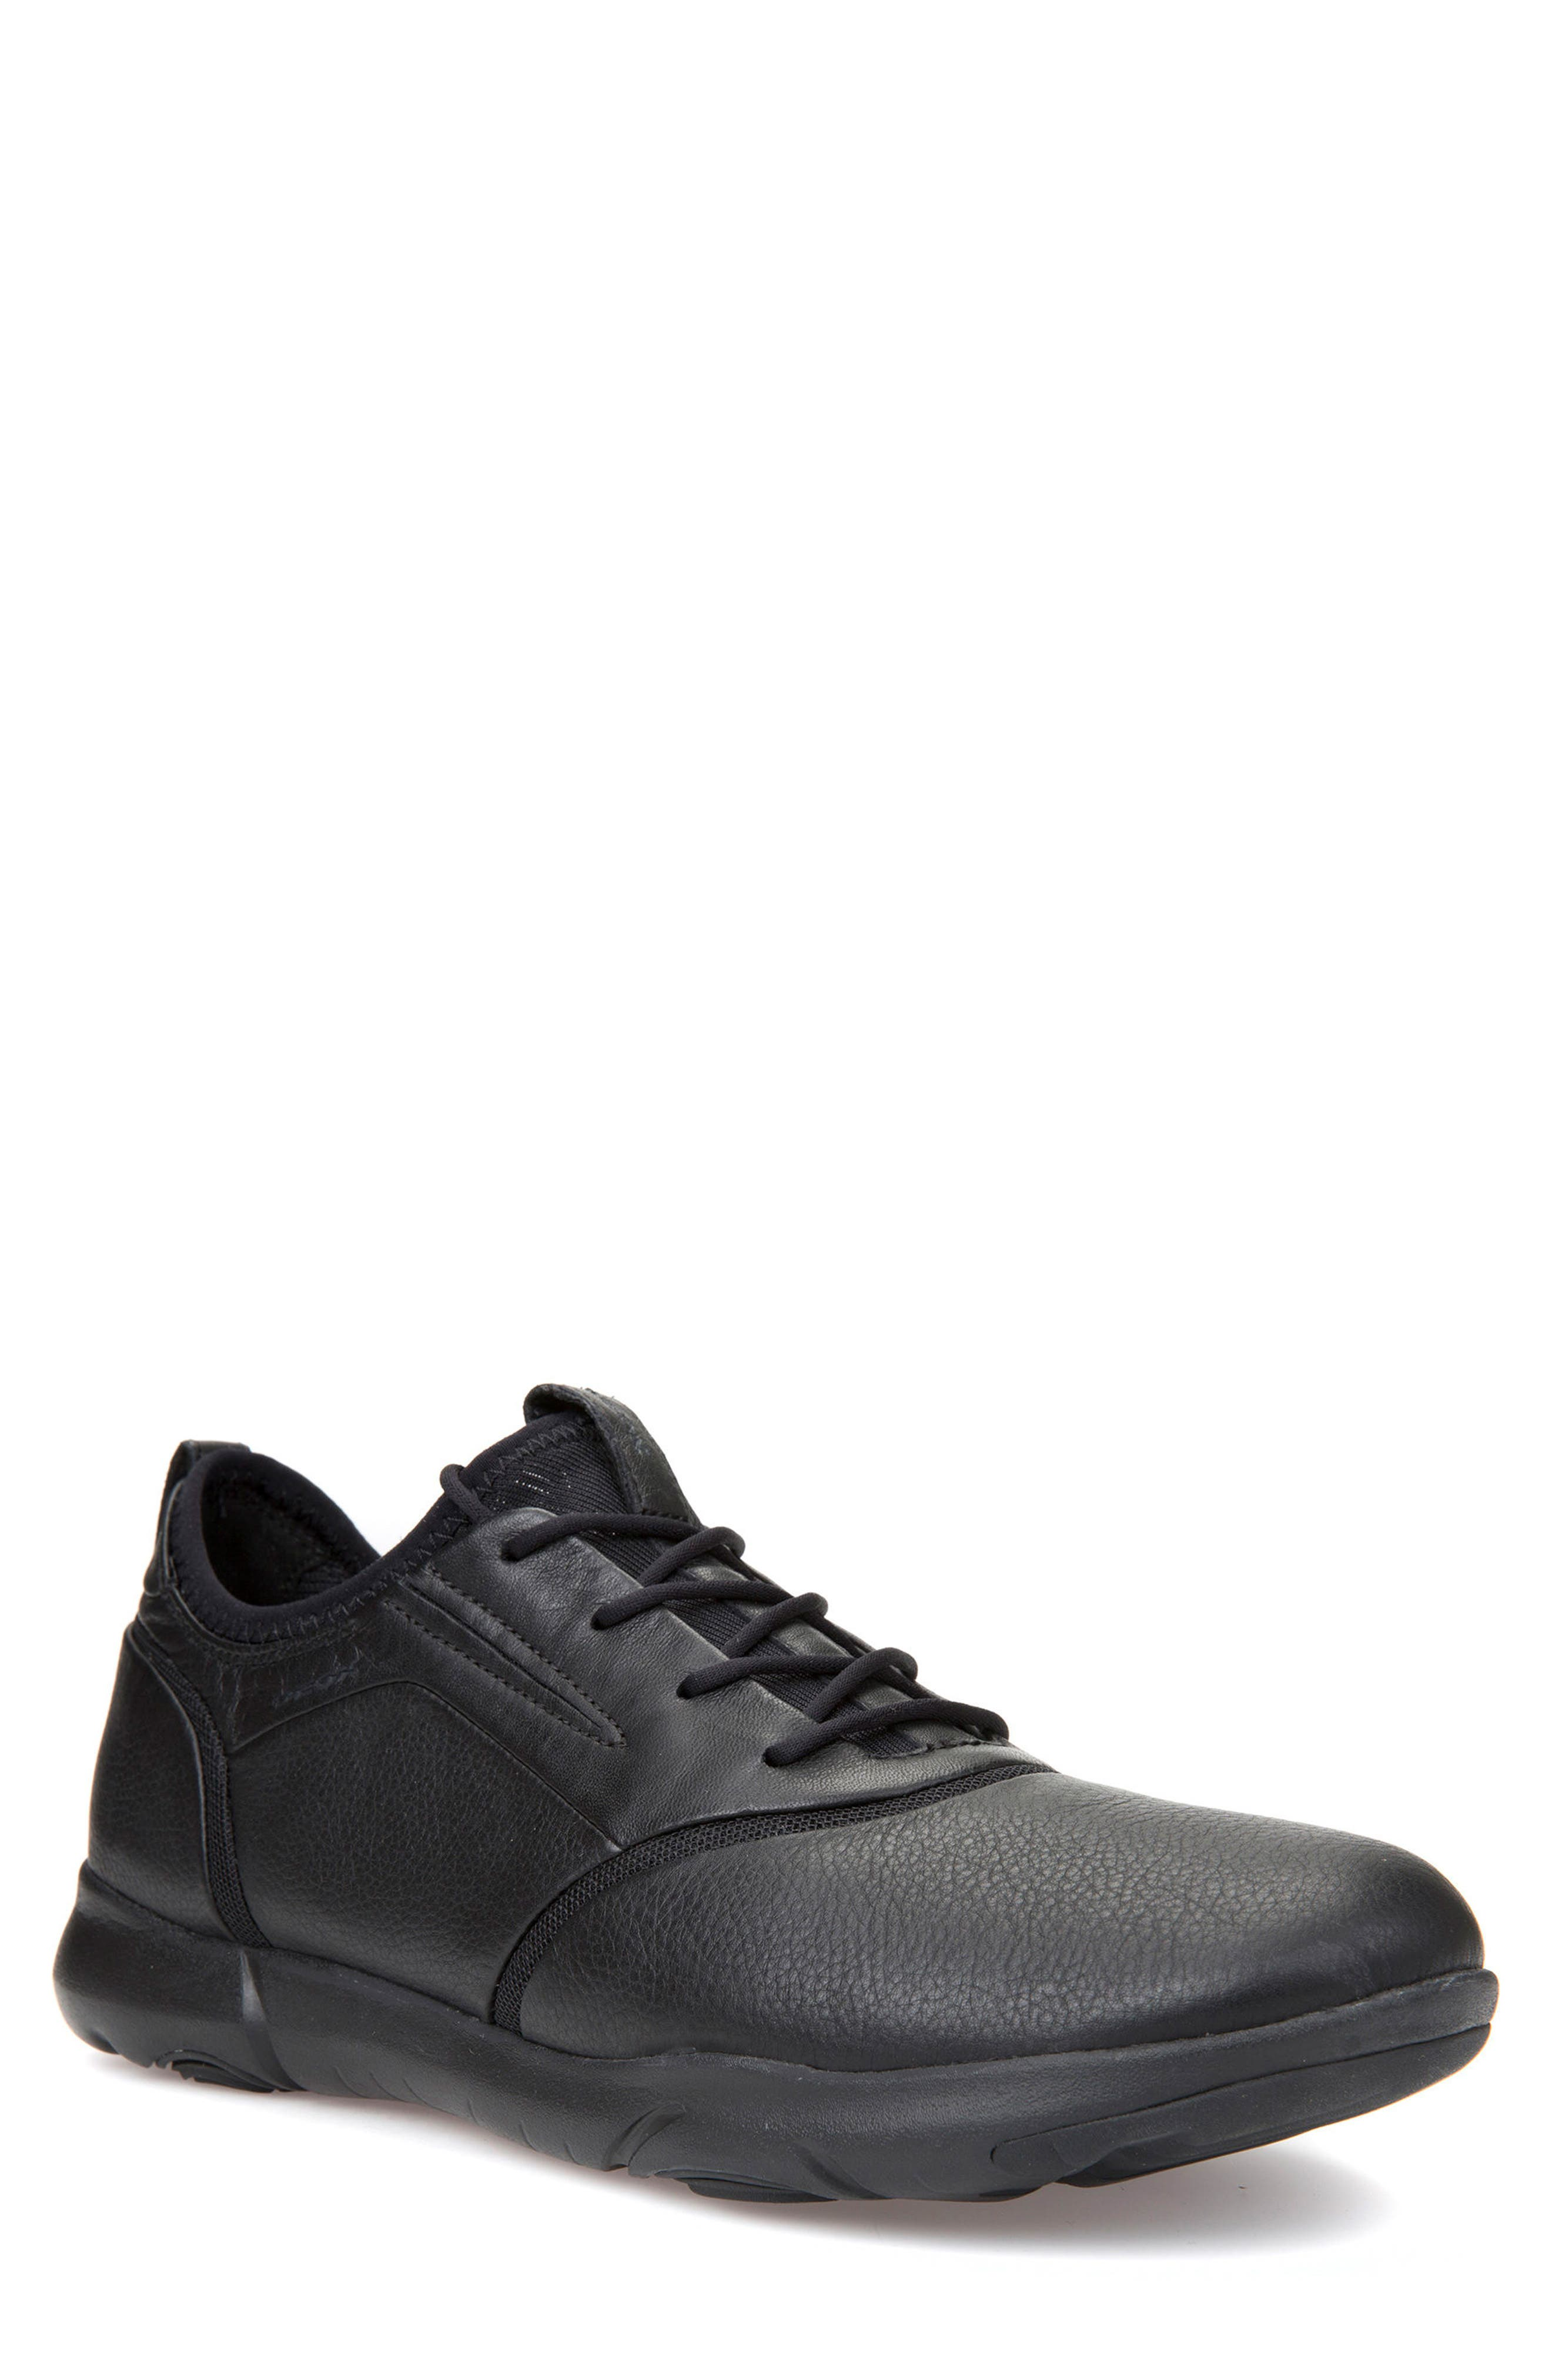 Geox Nebula S 4 Lace-Up Sneaker, Black